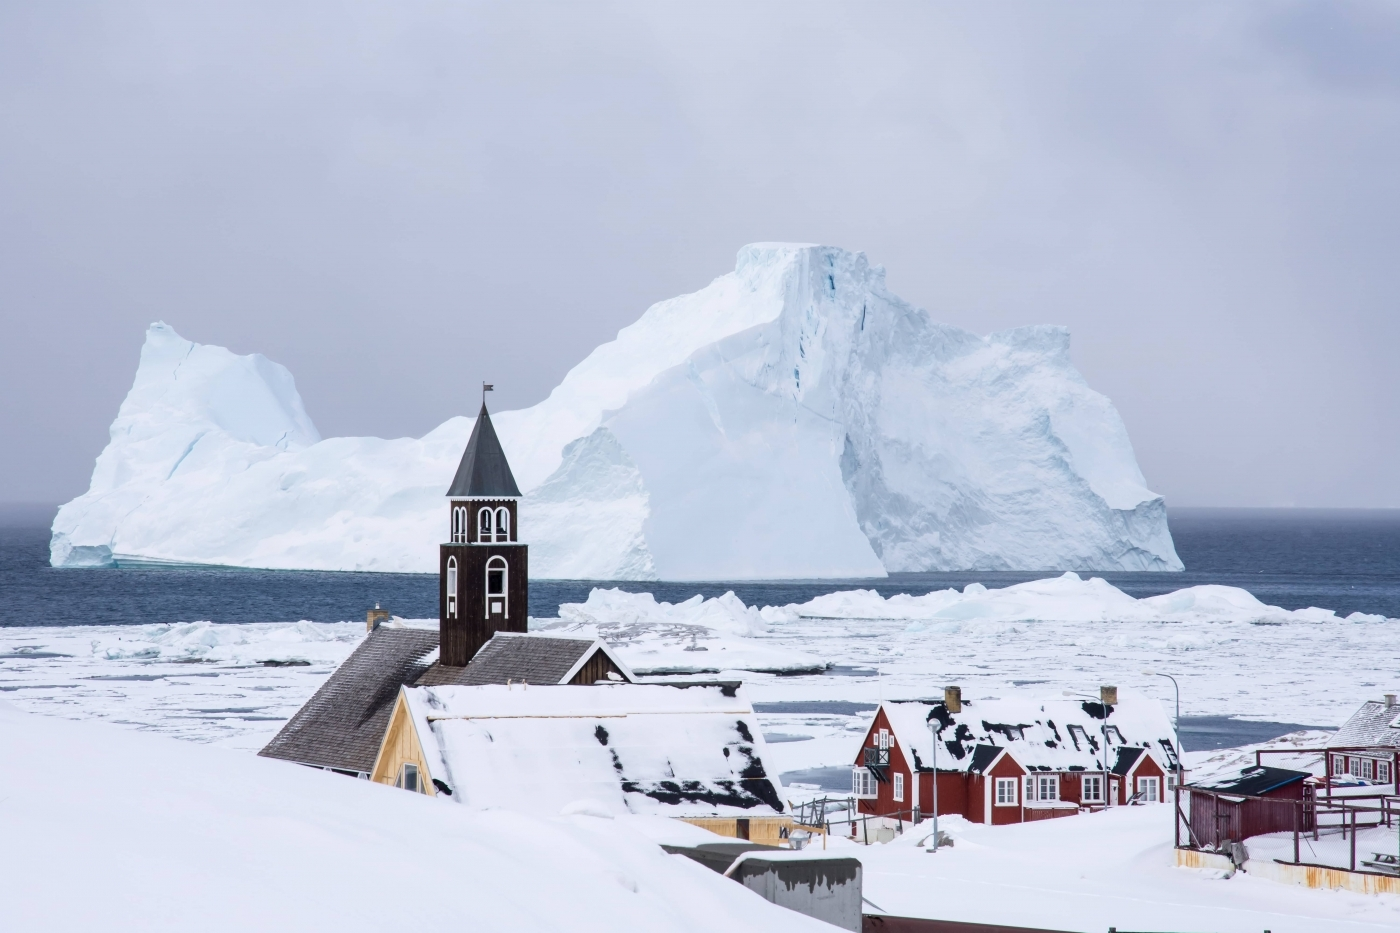 Zions church in Ilulissat. Photo by Inesa Matuliauskaite